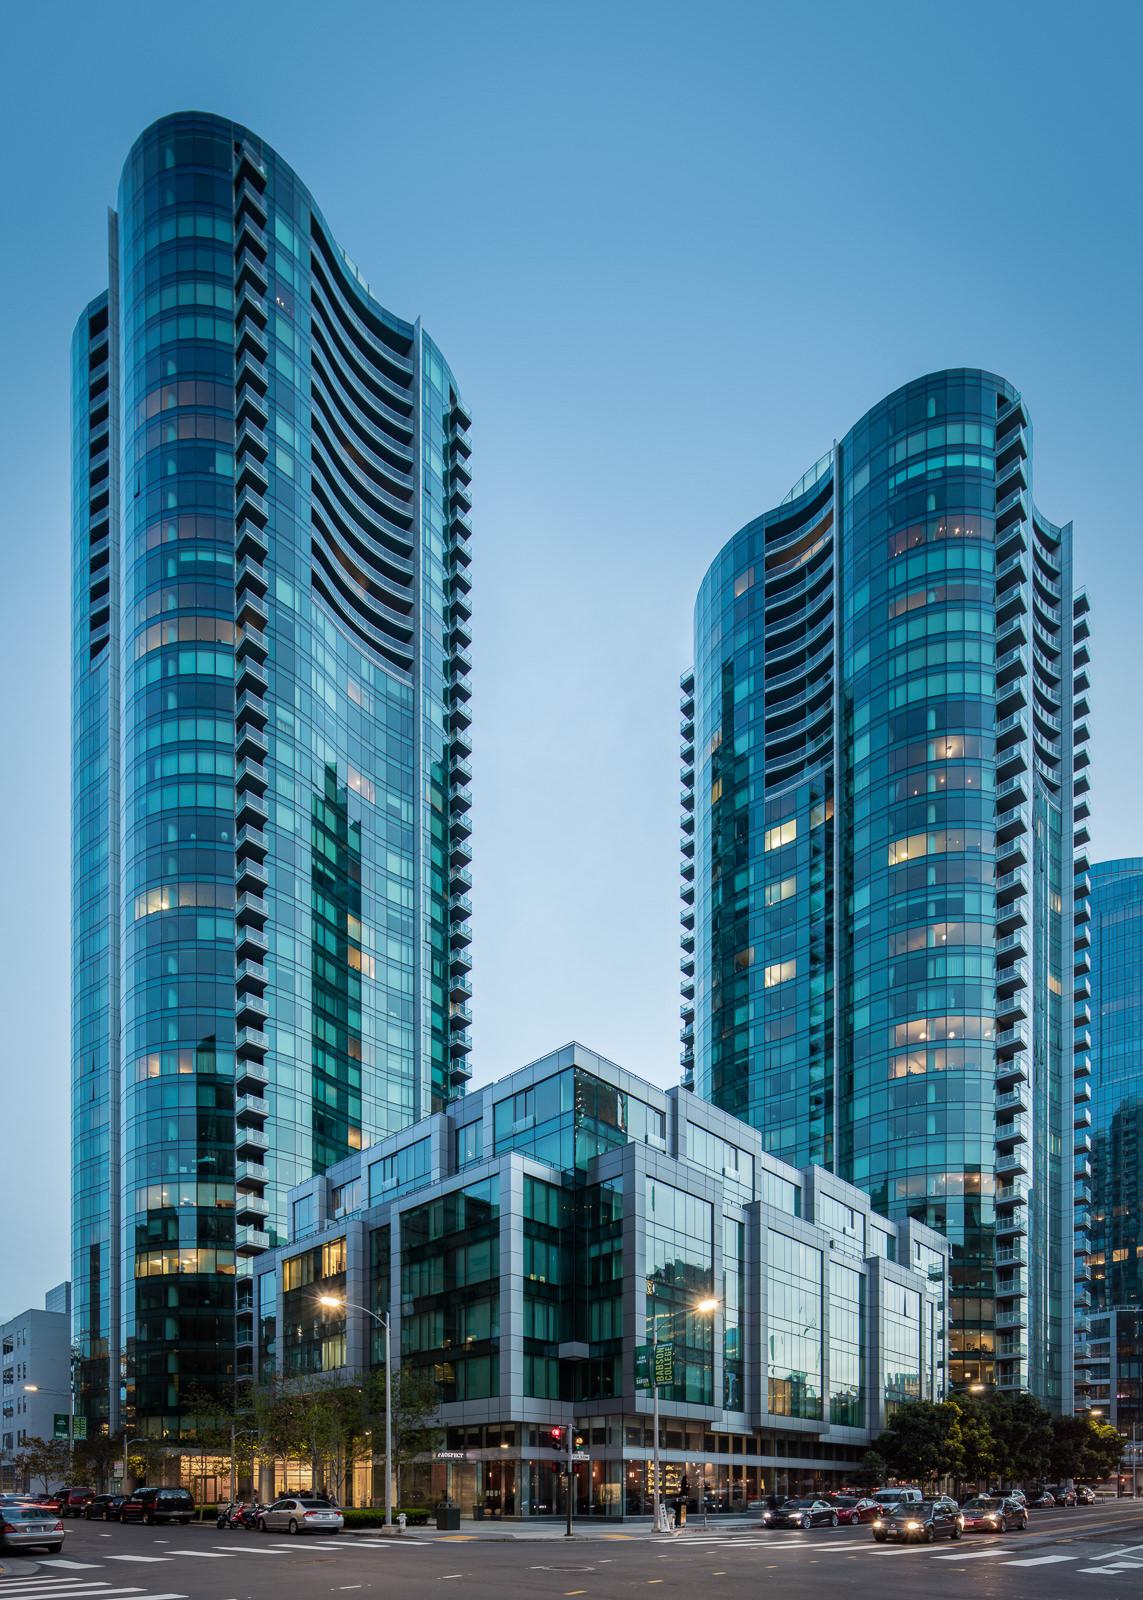 Infinity Towers, San Francisco, CA - Heller Manus / Arquitectonica